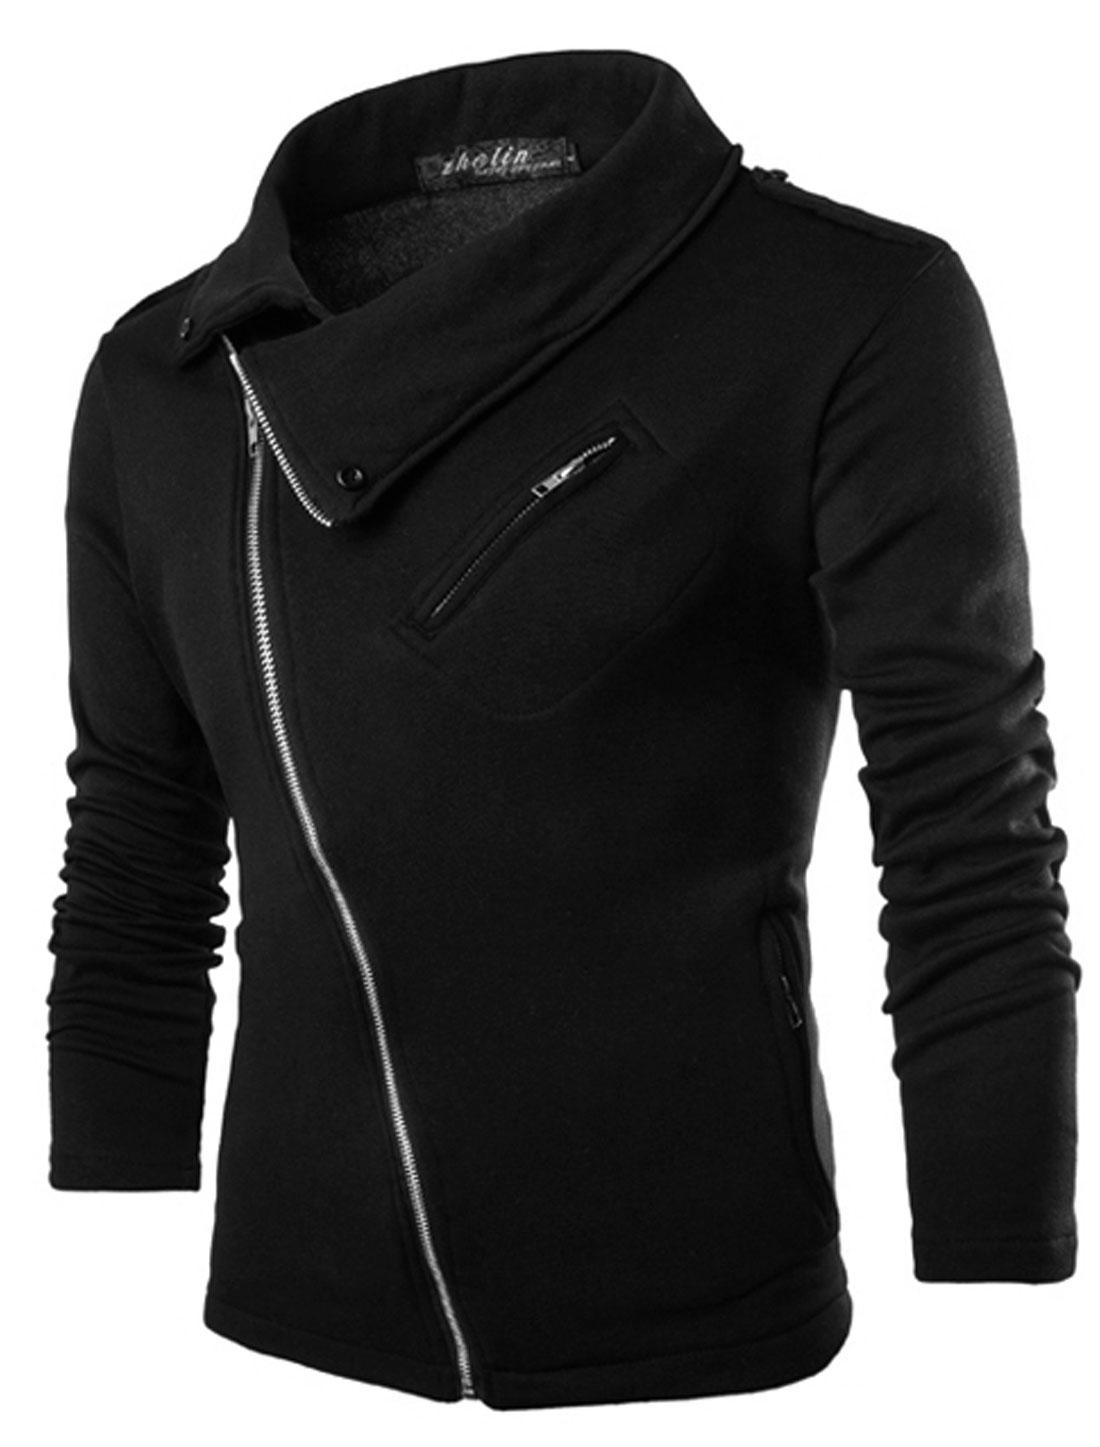 Men Long Sleeve Turn Down Collar Inclined Zipper Jacket Black M